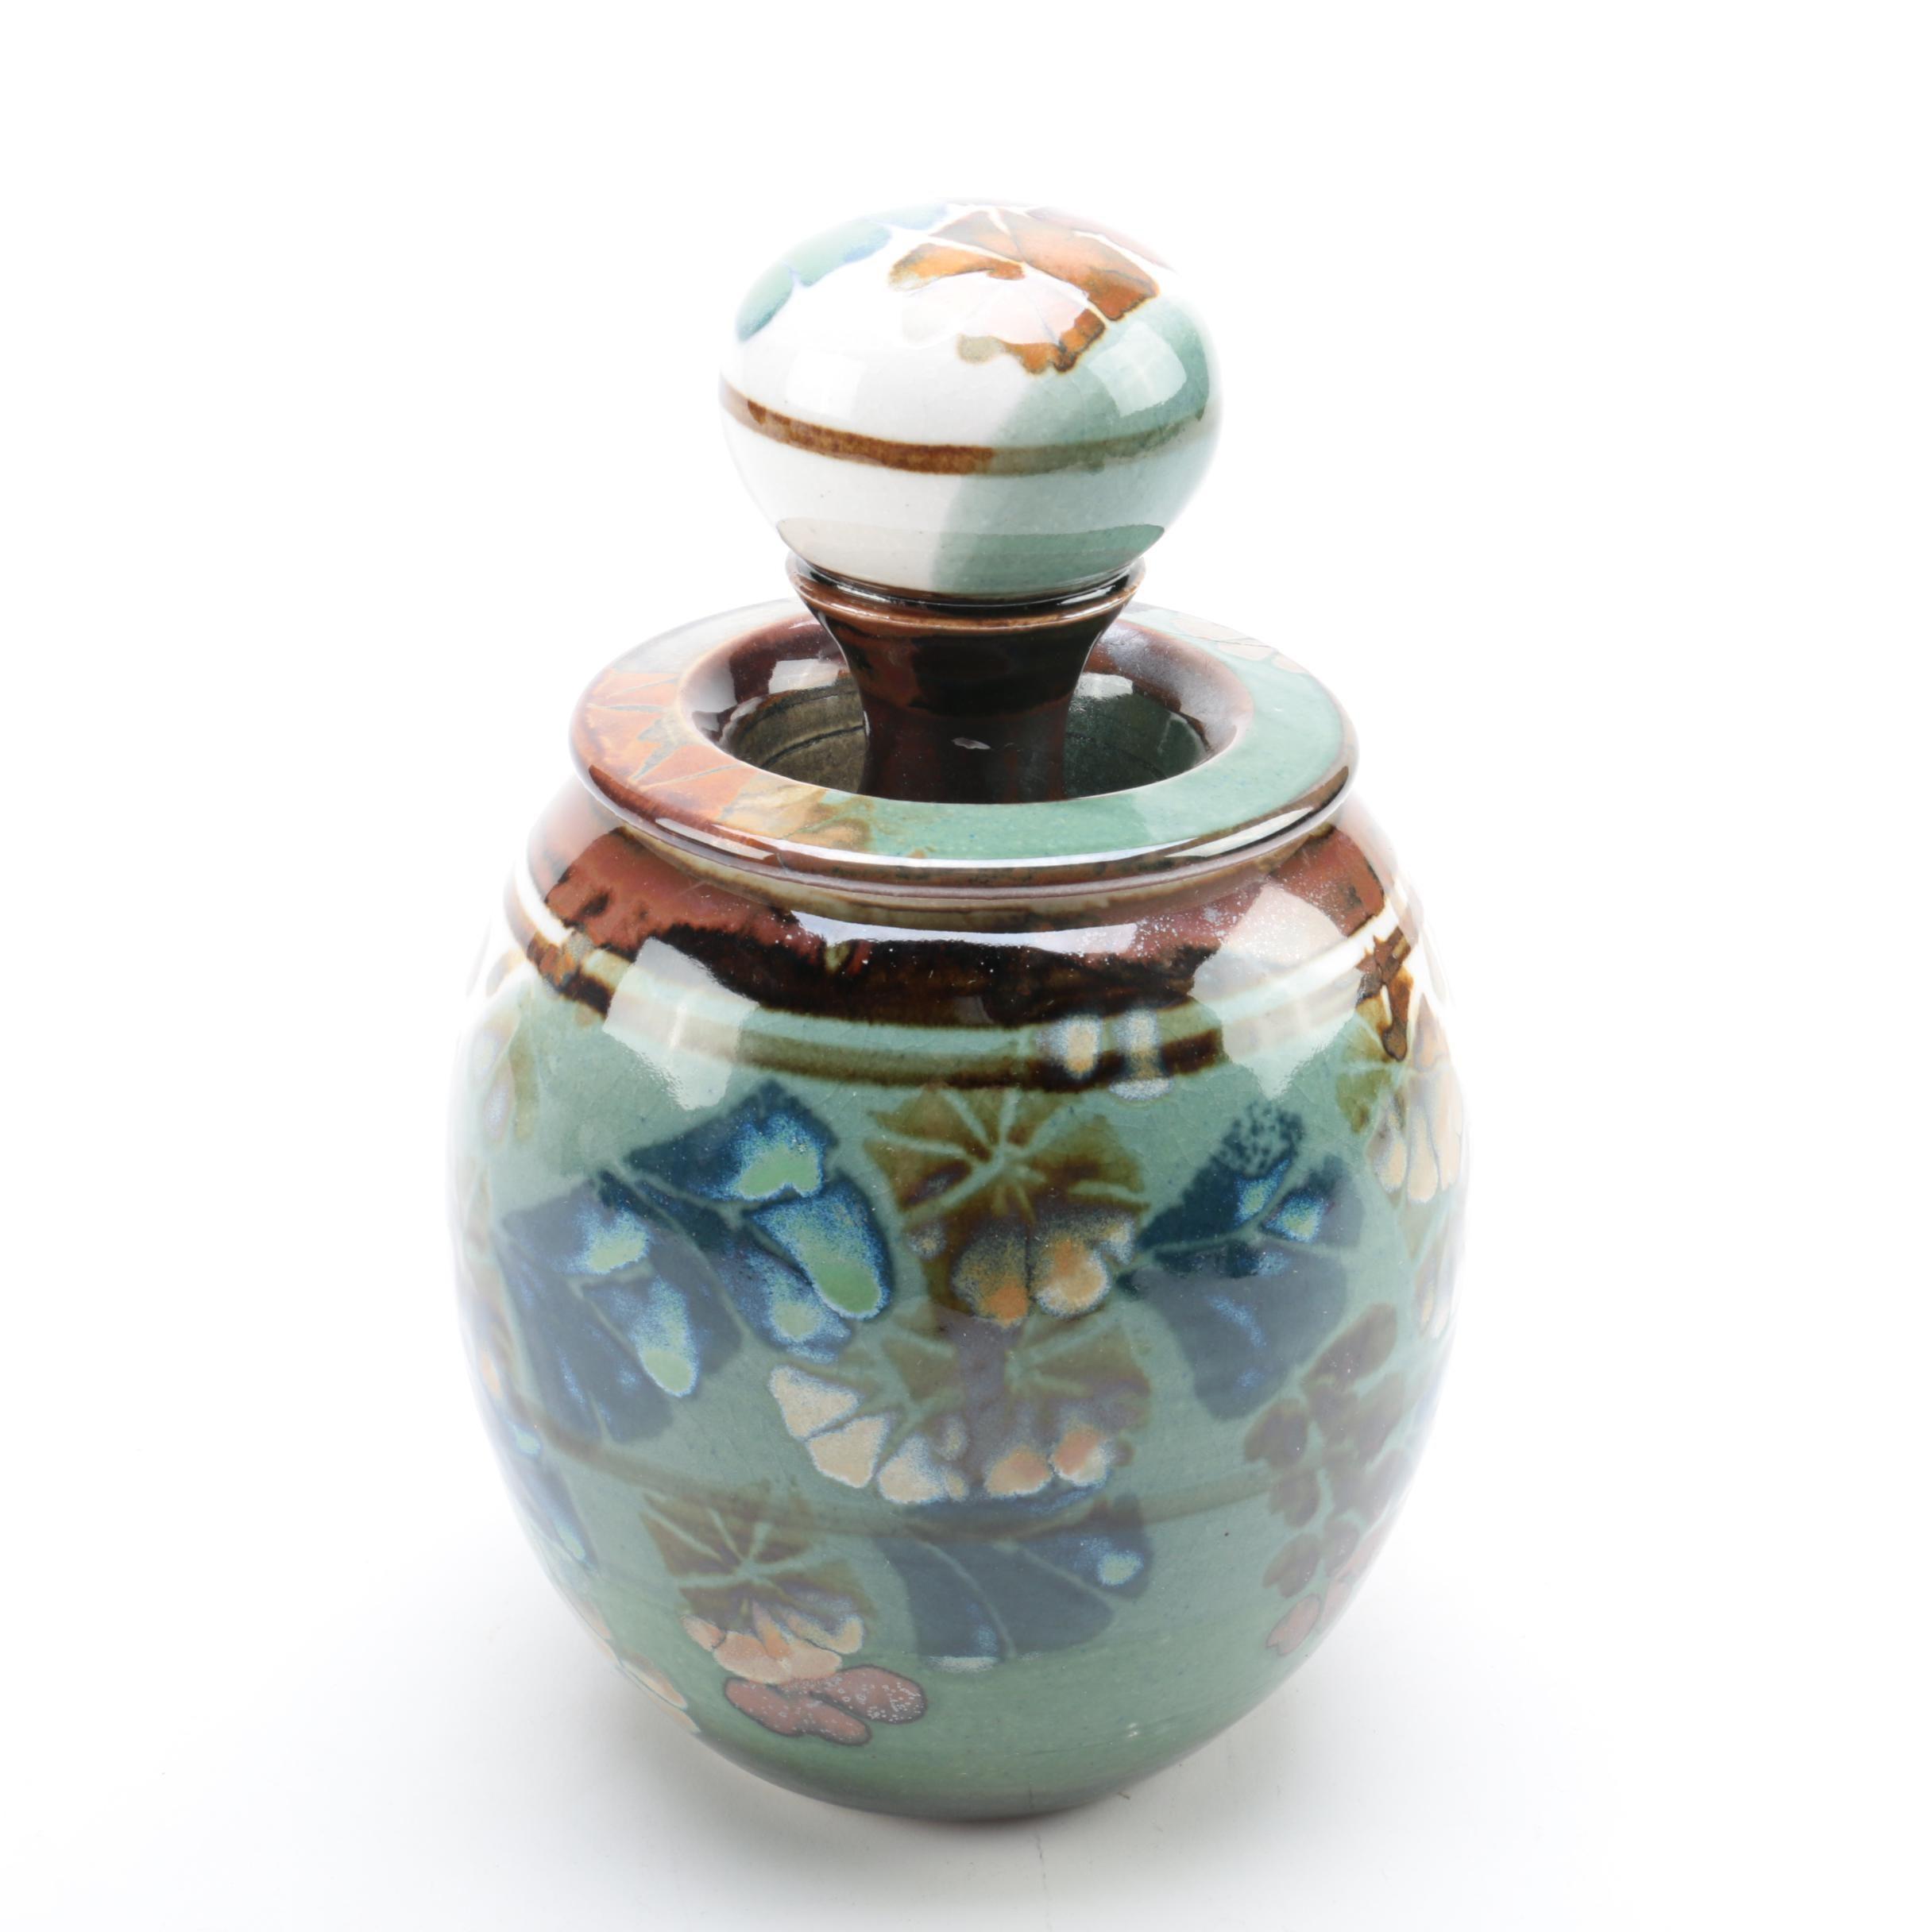 Apple Lane Pottery Signed Bill Nagengast Studio Pottery Jar